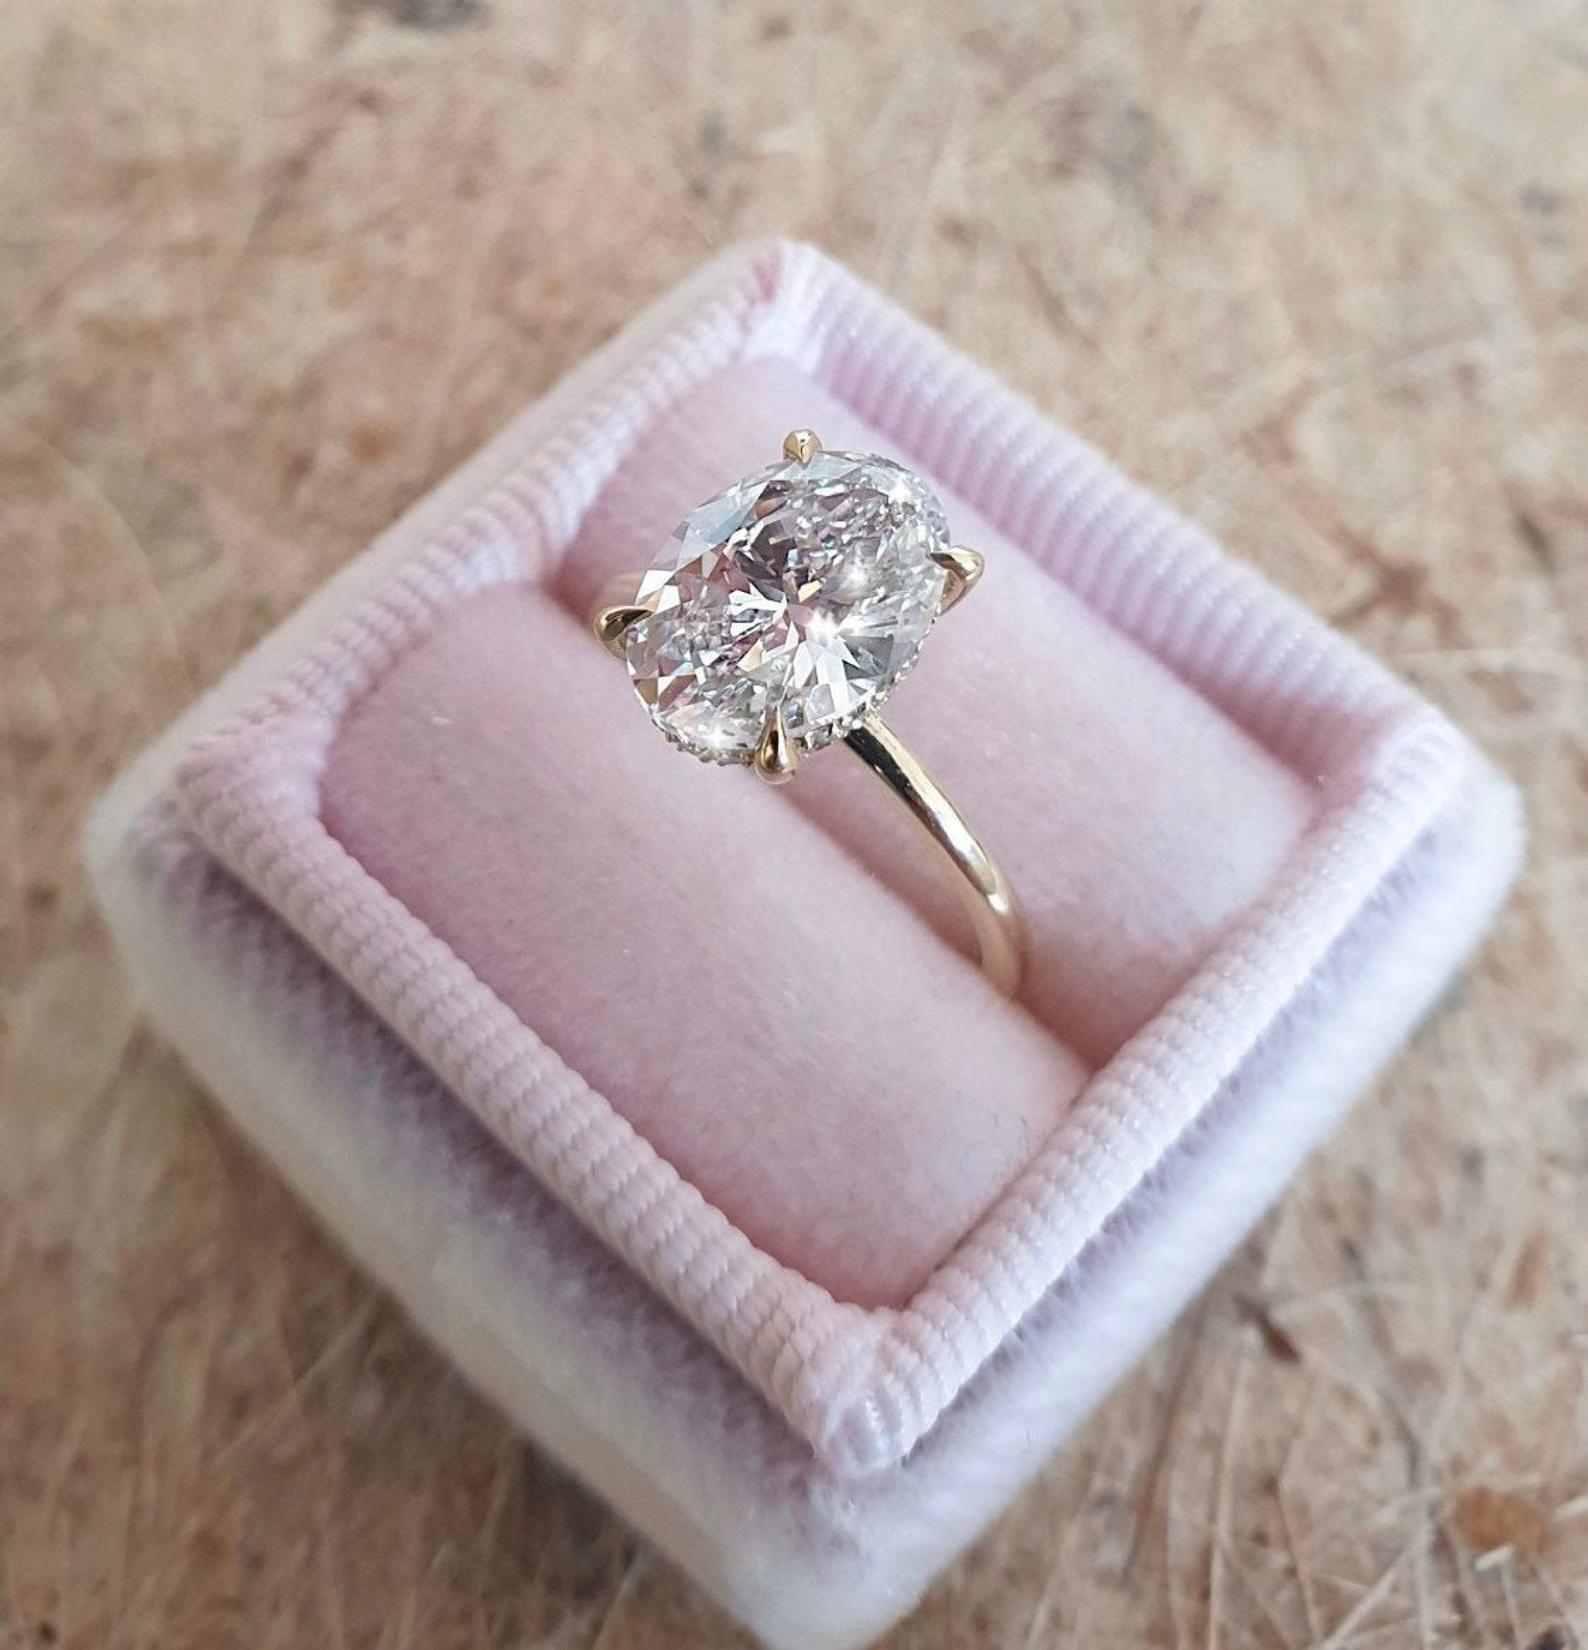 2 carat oval diamond engagement ringhidden halo 14k yellow